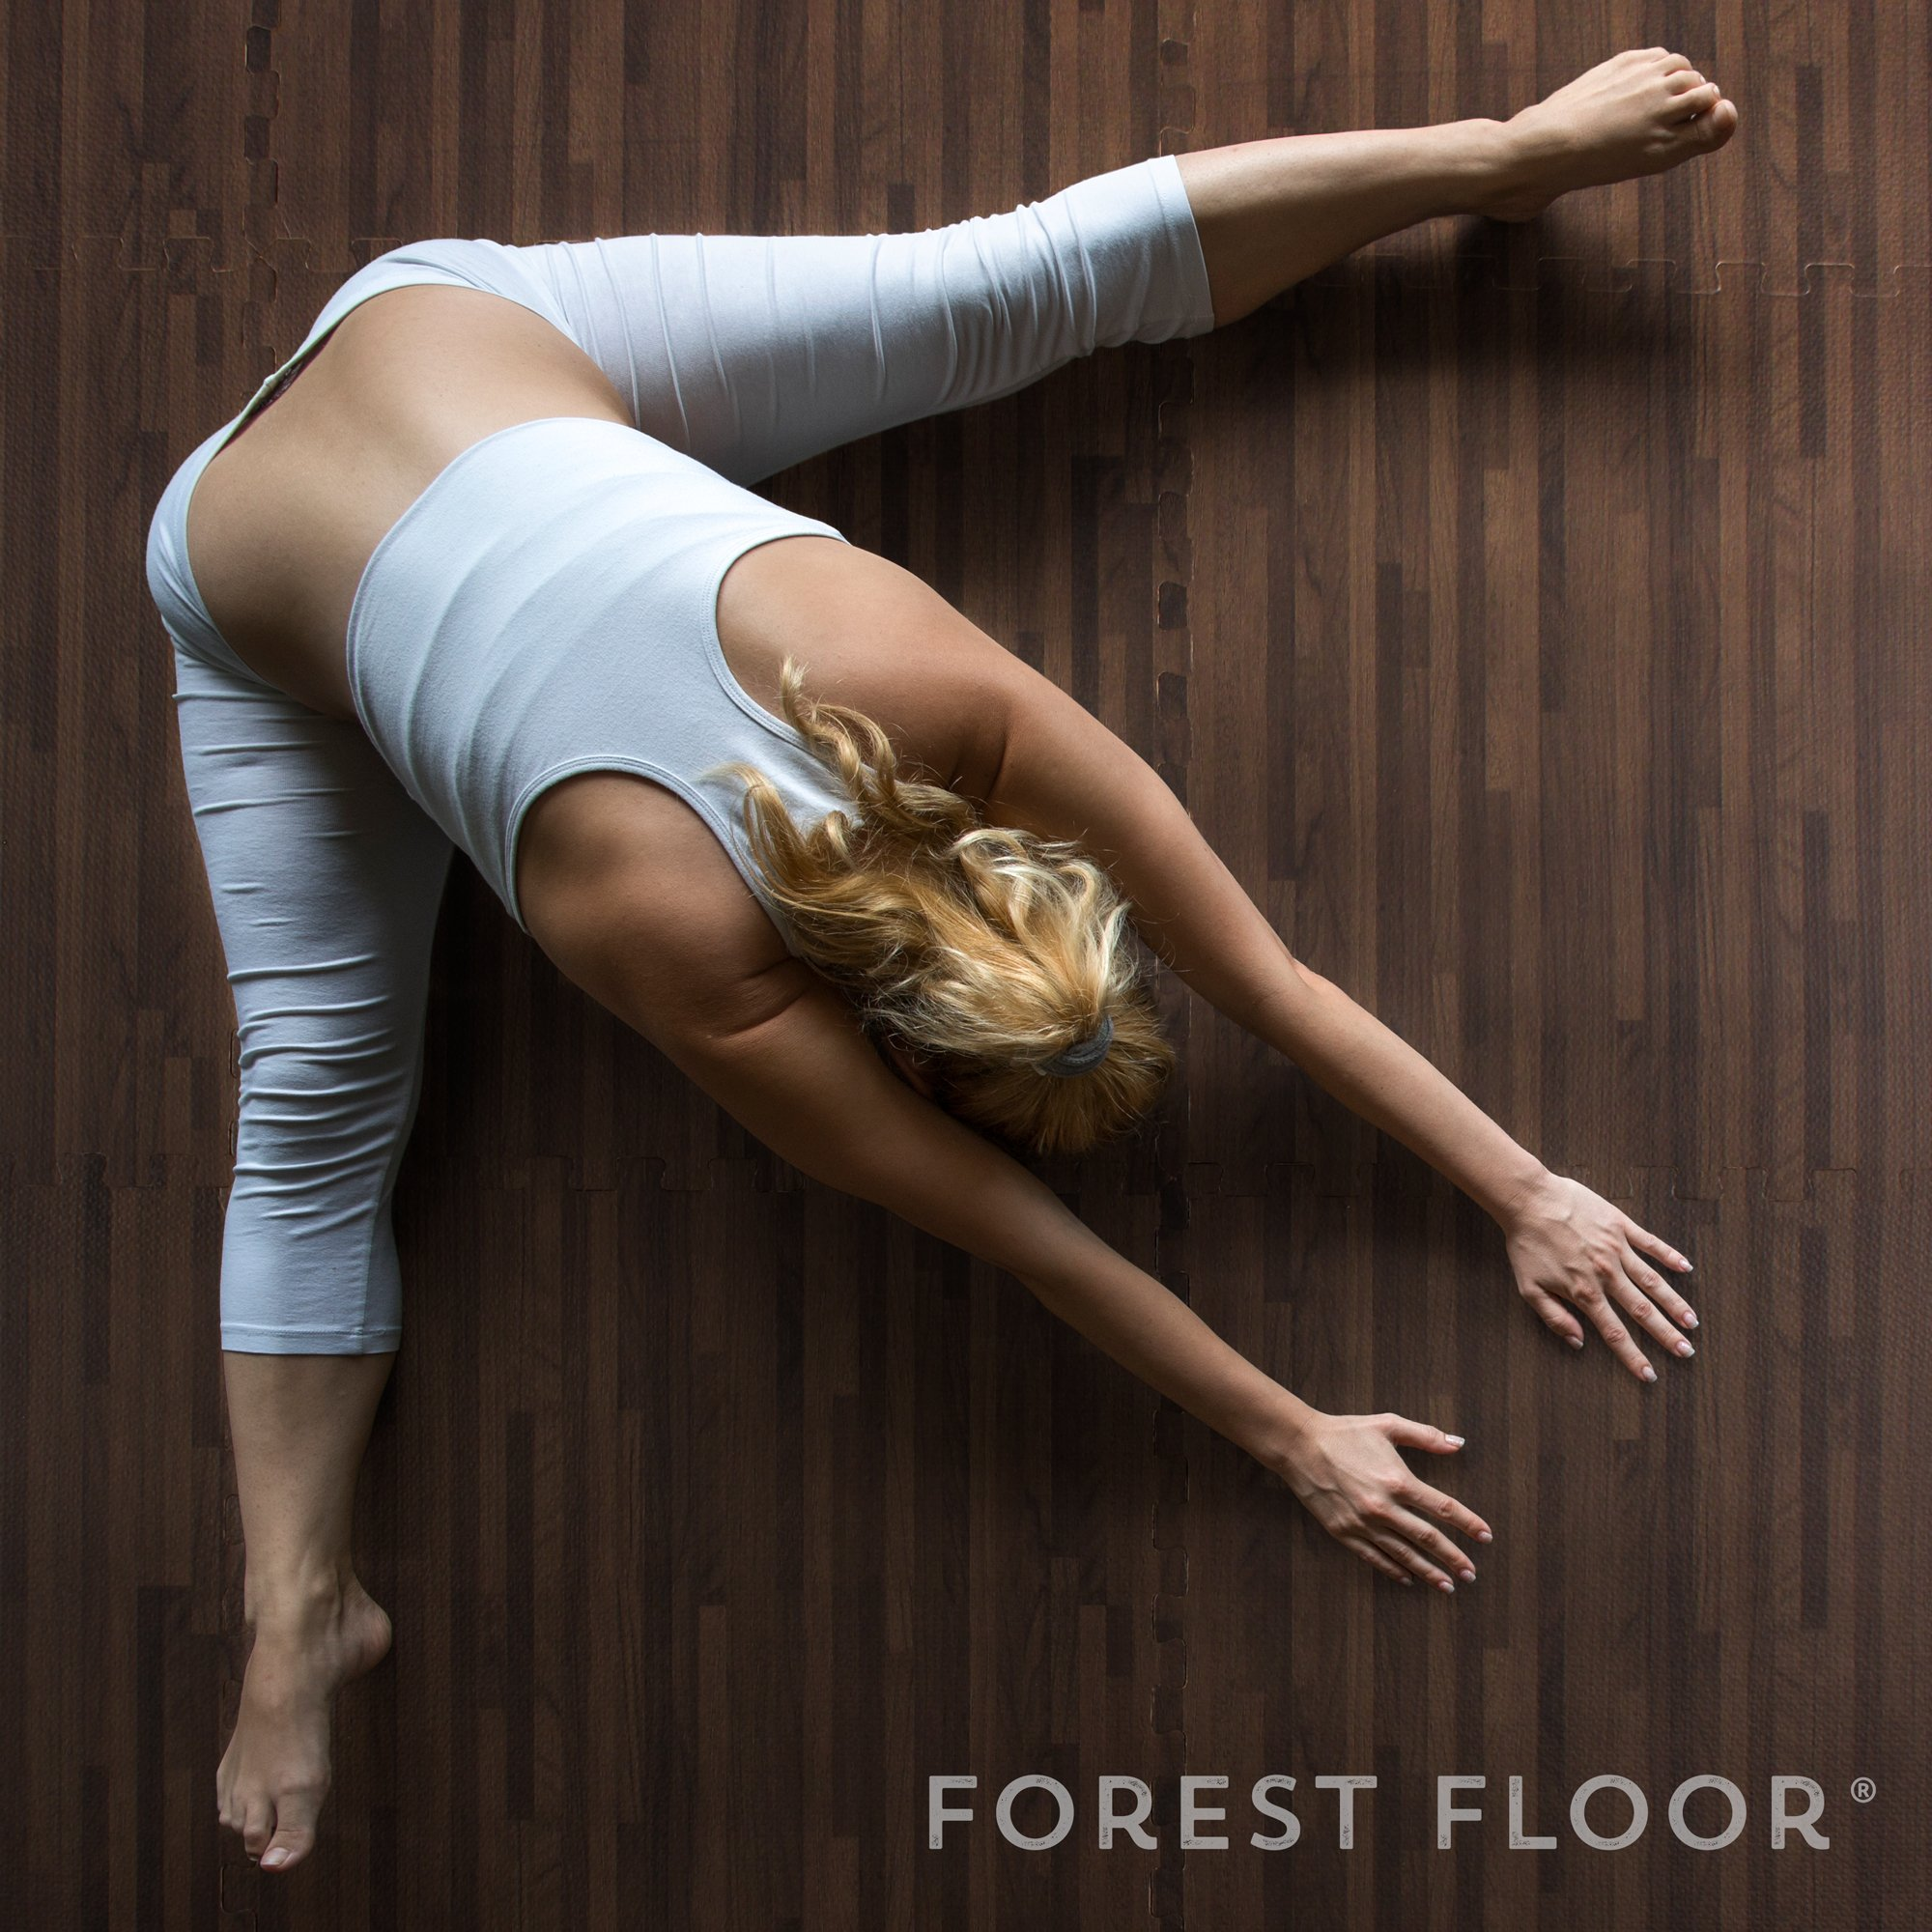 Forest Floor 3/8'' Thick Printed Wood Grain Interlocking Foam Floor Mats, 16 Sq Ft (4 Tiles), Walnut by Forest Floor (Image #7)